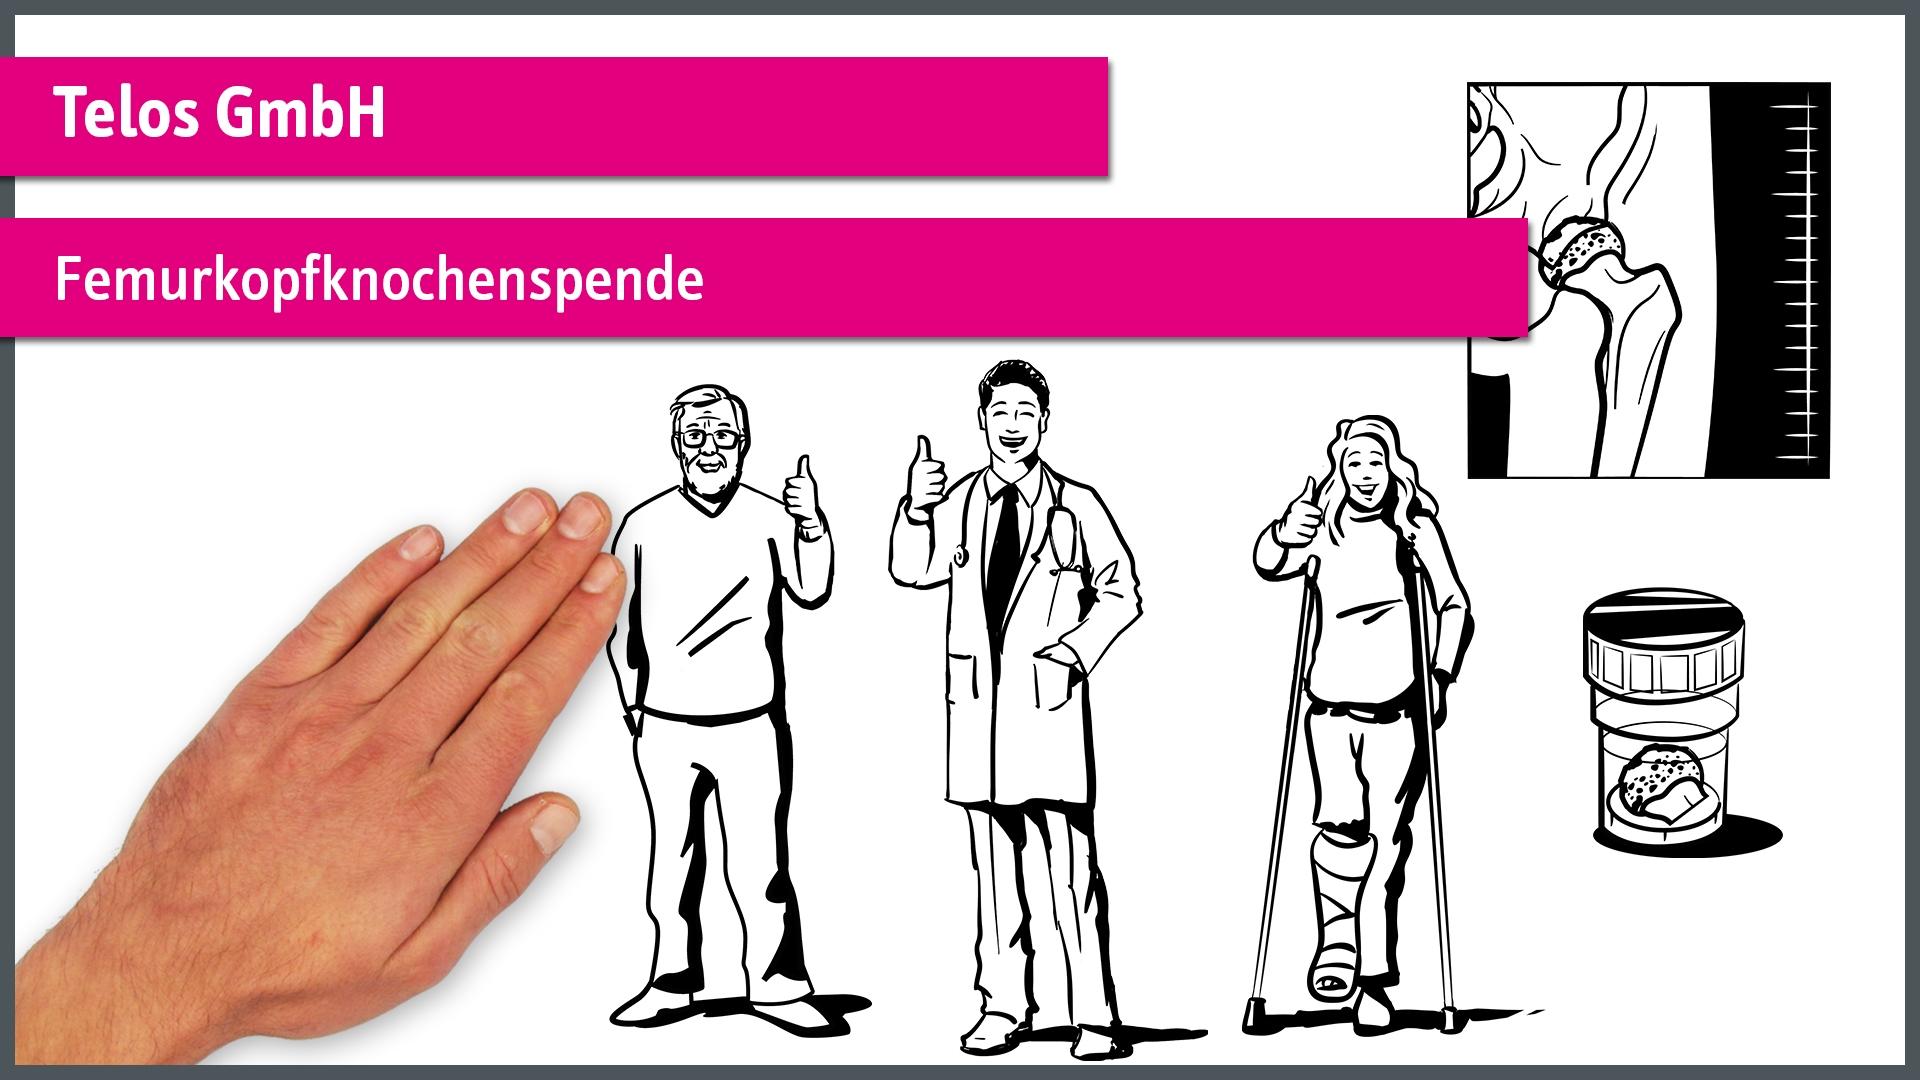 Femurkopfknochenspende - Telos GmbH